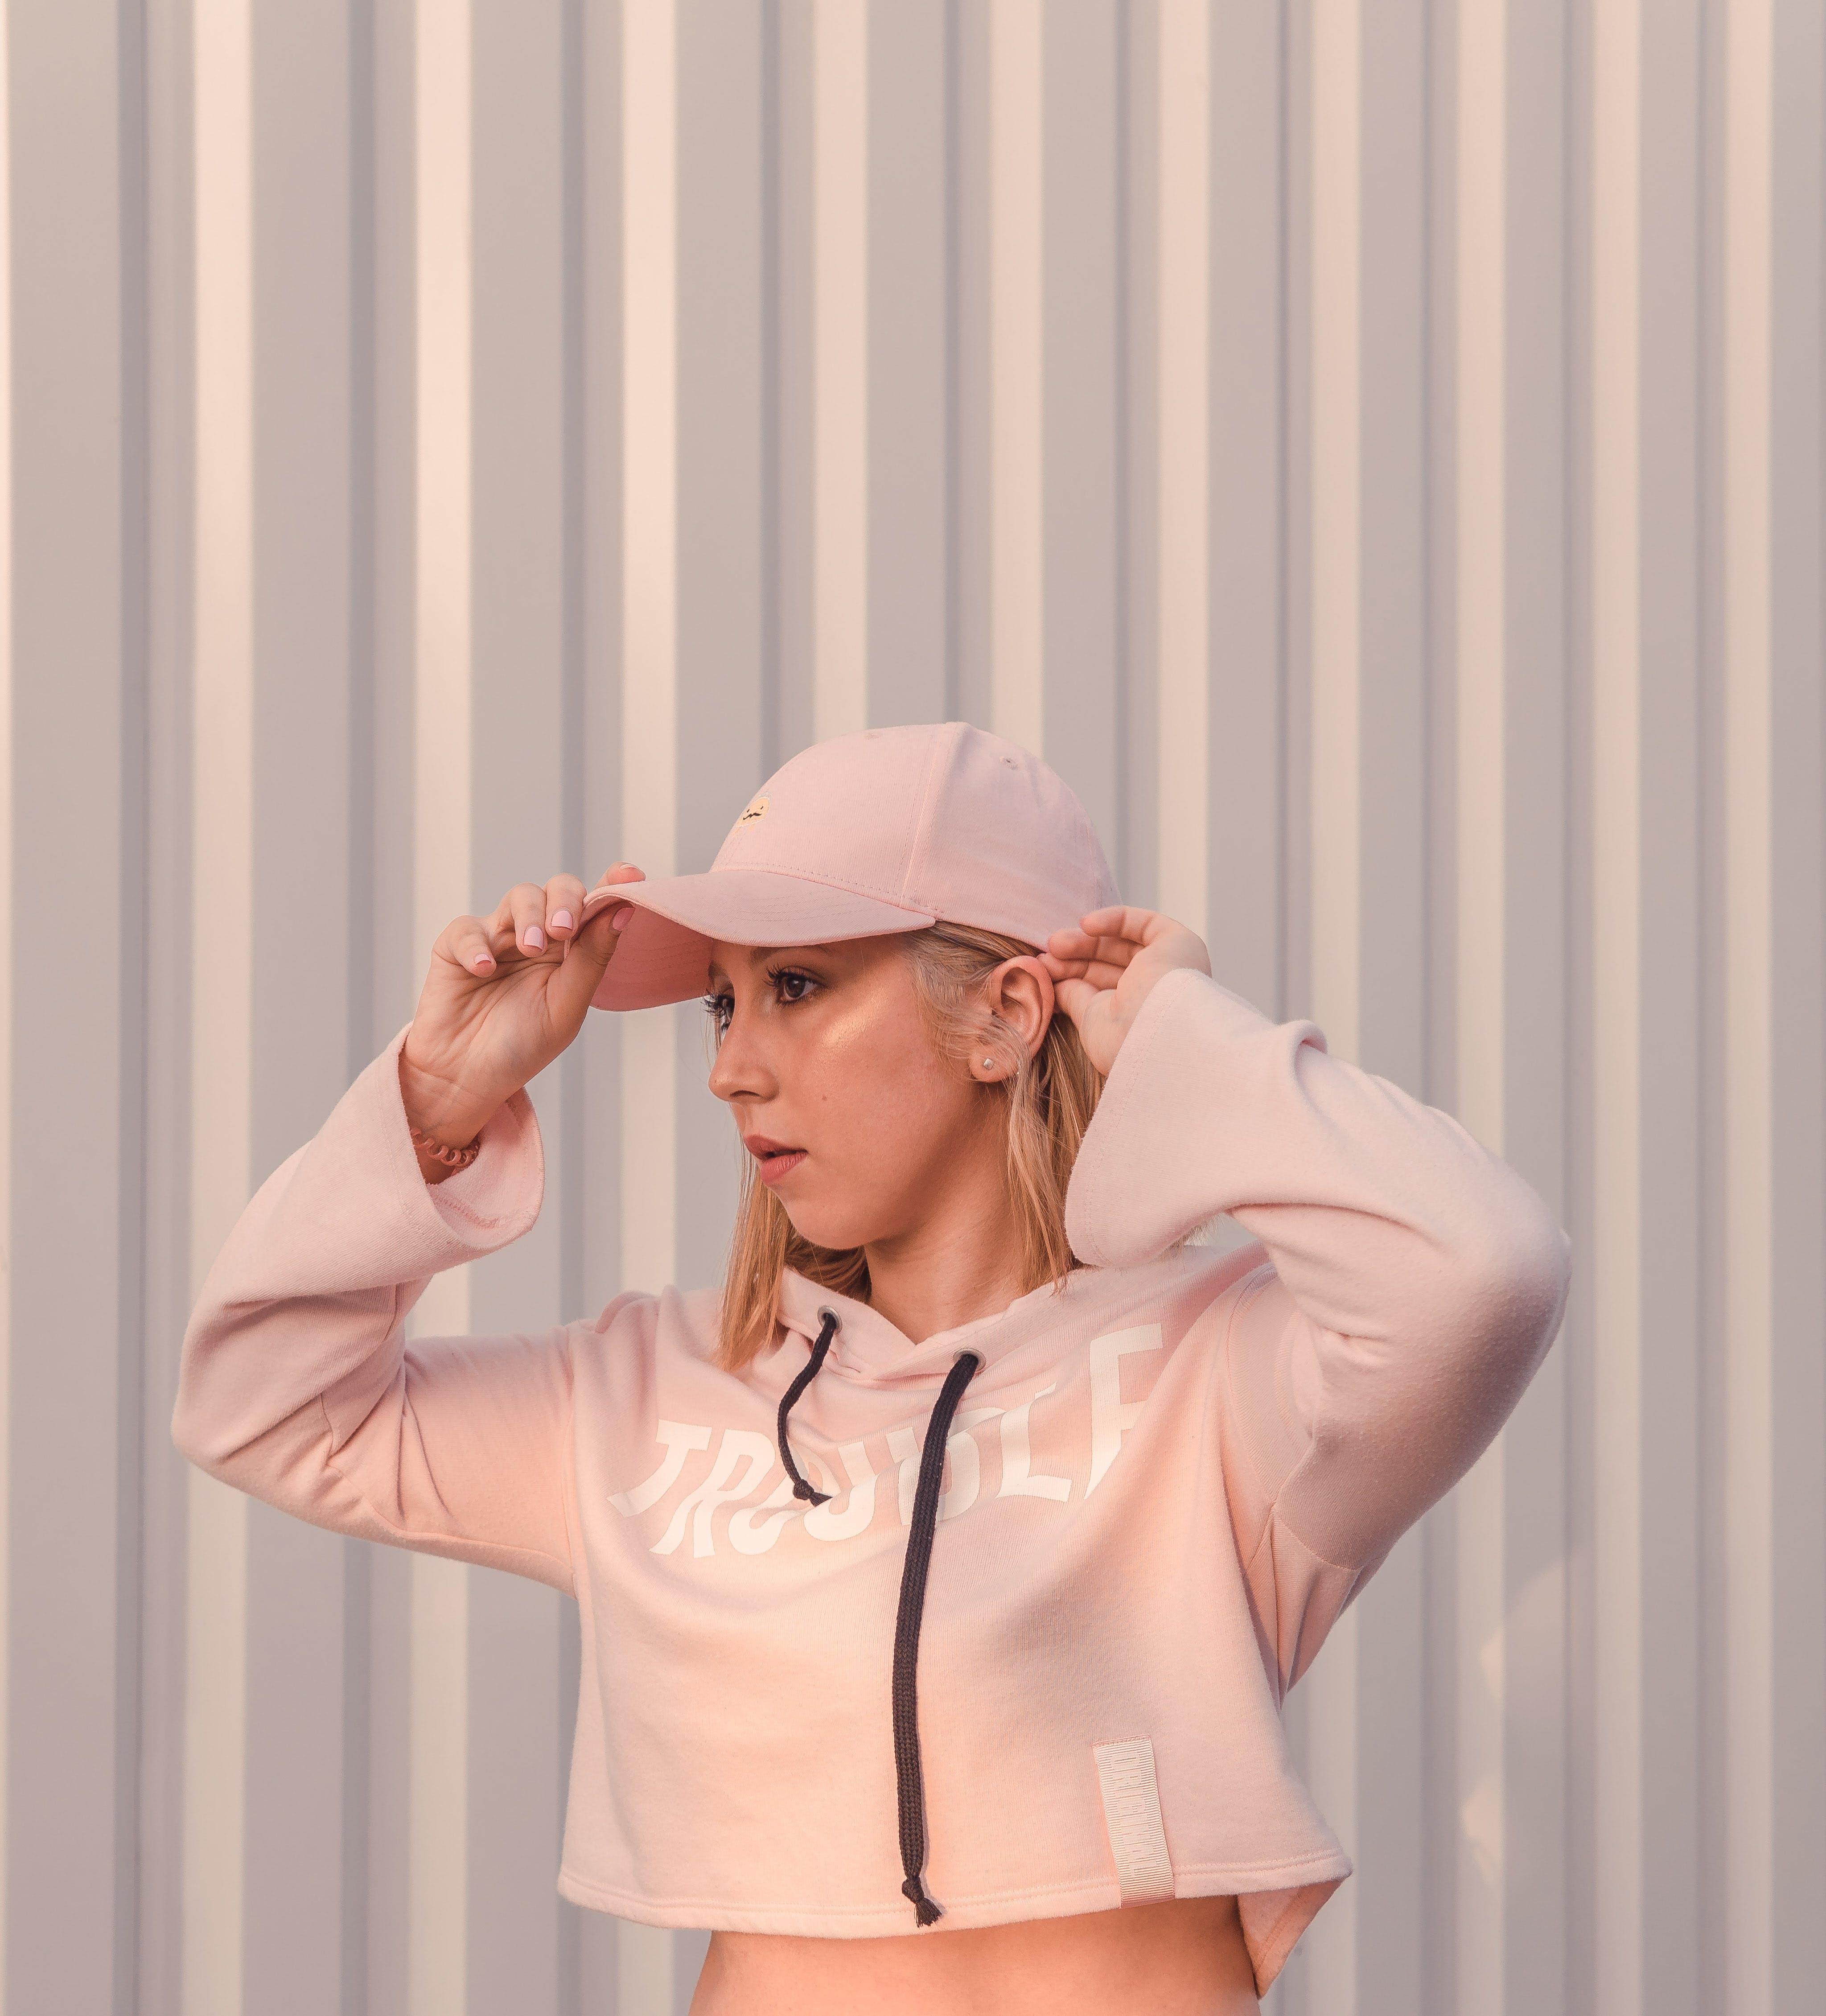 Photo of Woman Wearing Pink Crop Top